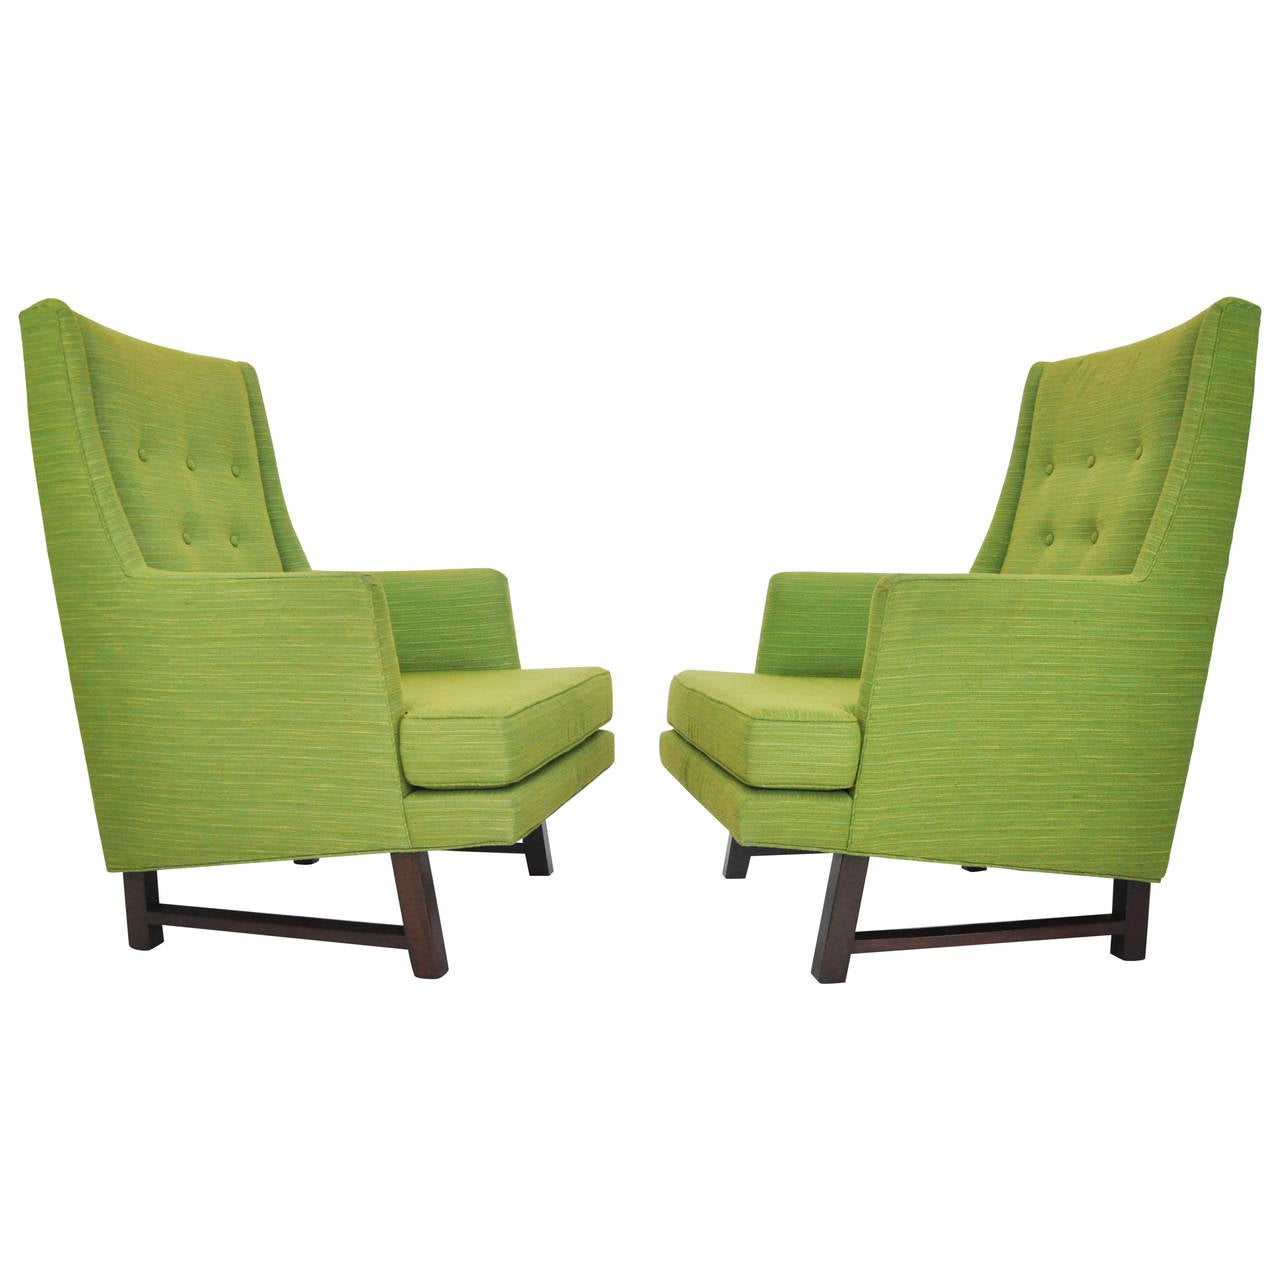 Dunbar high back lounge chairs by edward wormley at 1stdibs - Edward wormley chairs ...